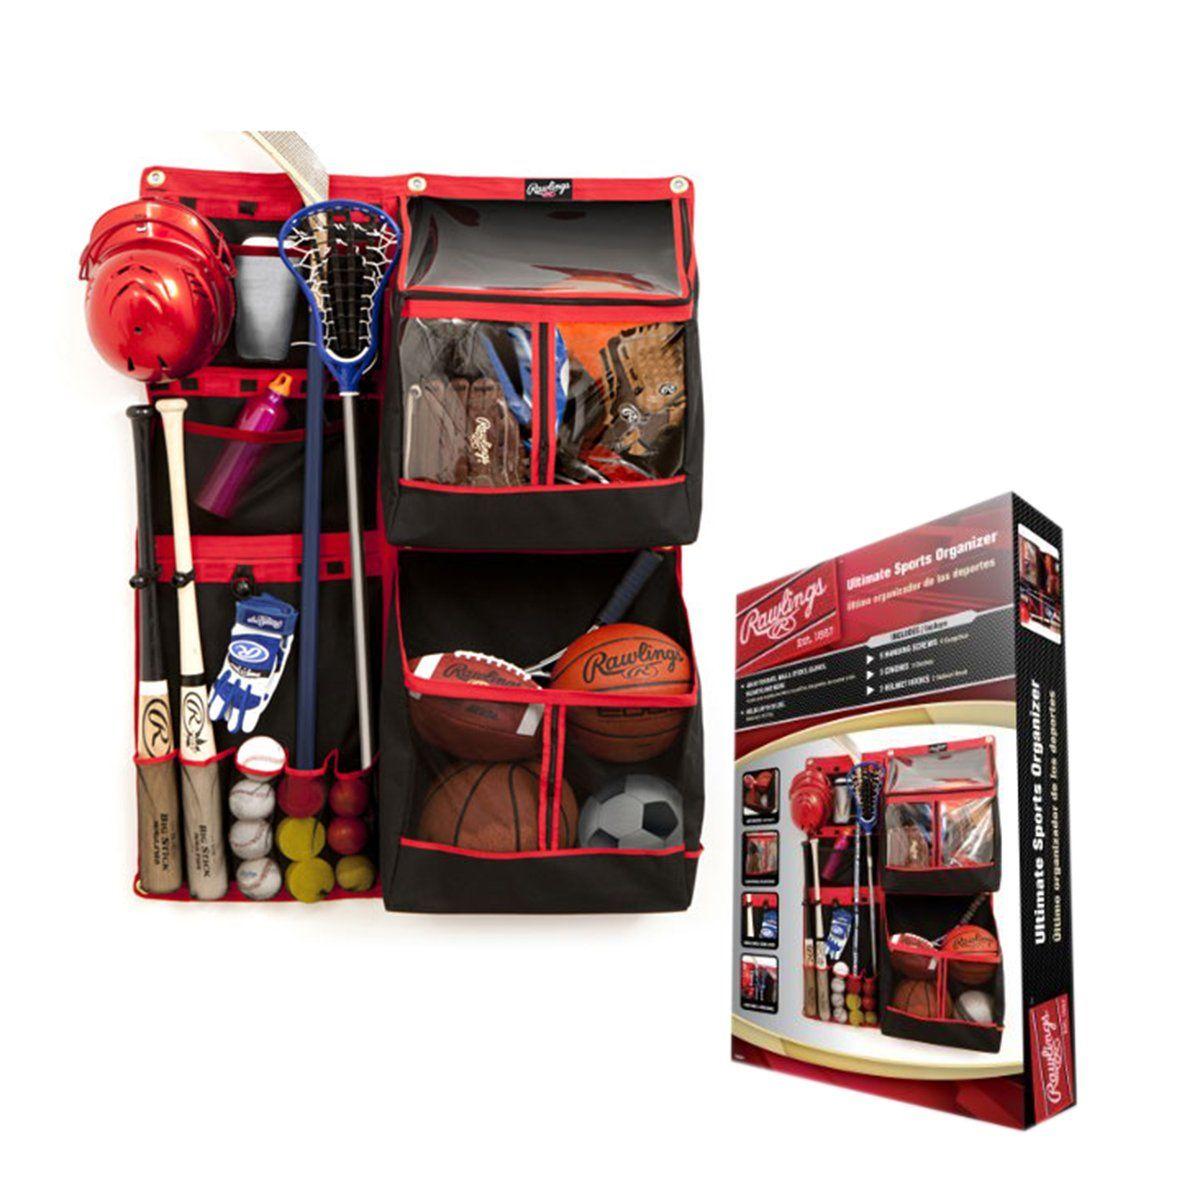 Rawlings Ultimate Sports Equipment Organizer FSSB36 Bats